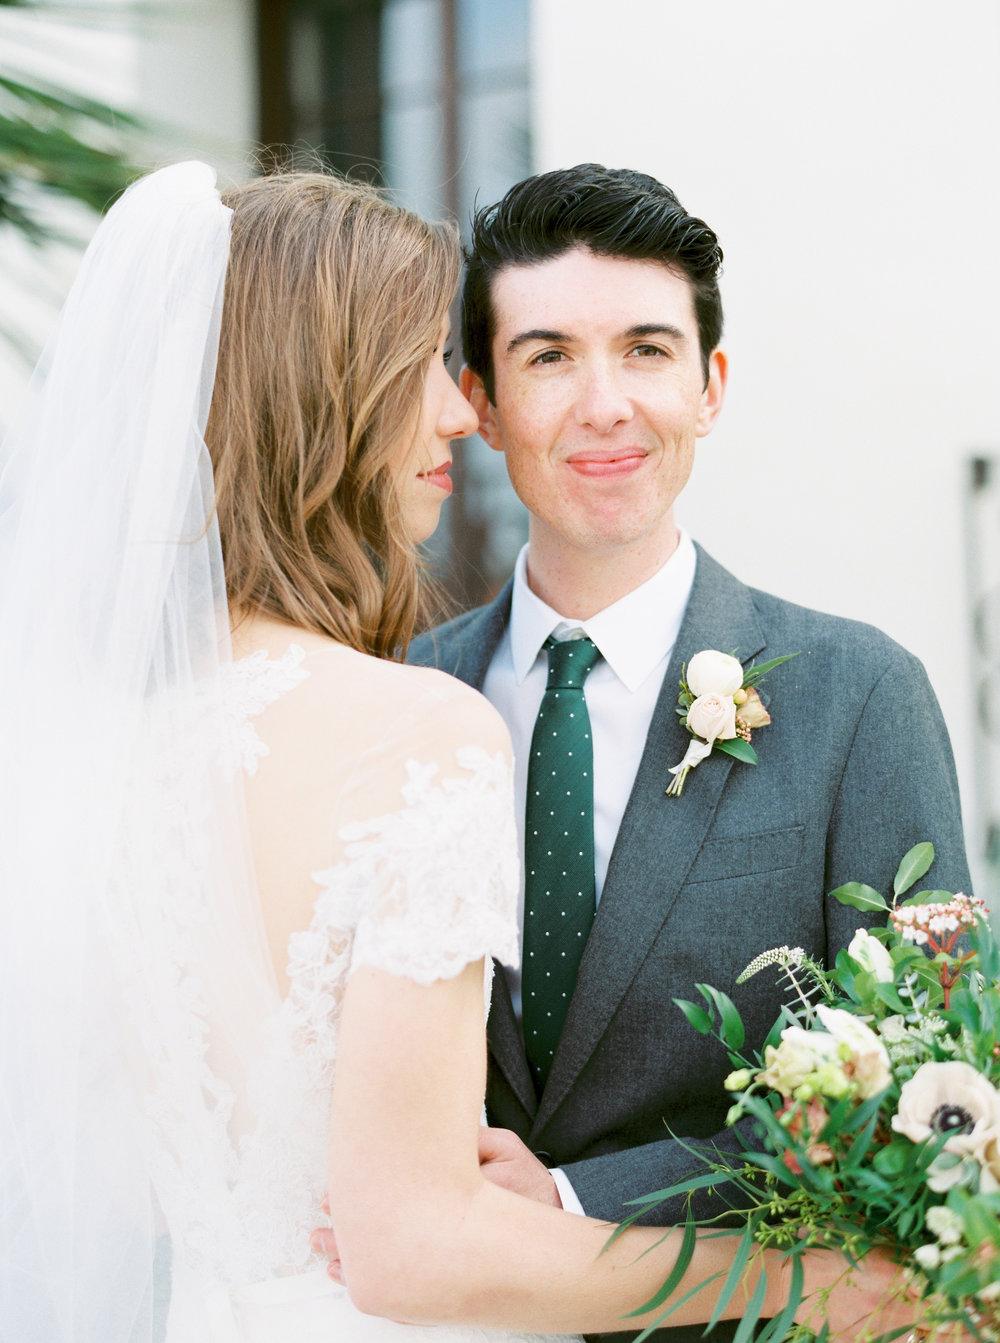 Log-cabin-wedding-in-presidio-san-francisco-california-desintation-wedding-photography-83.jpg